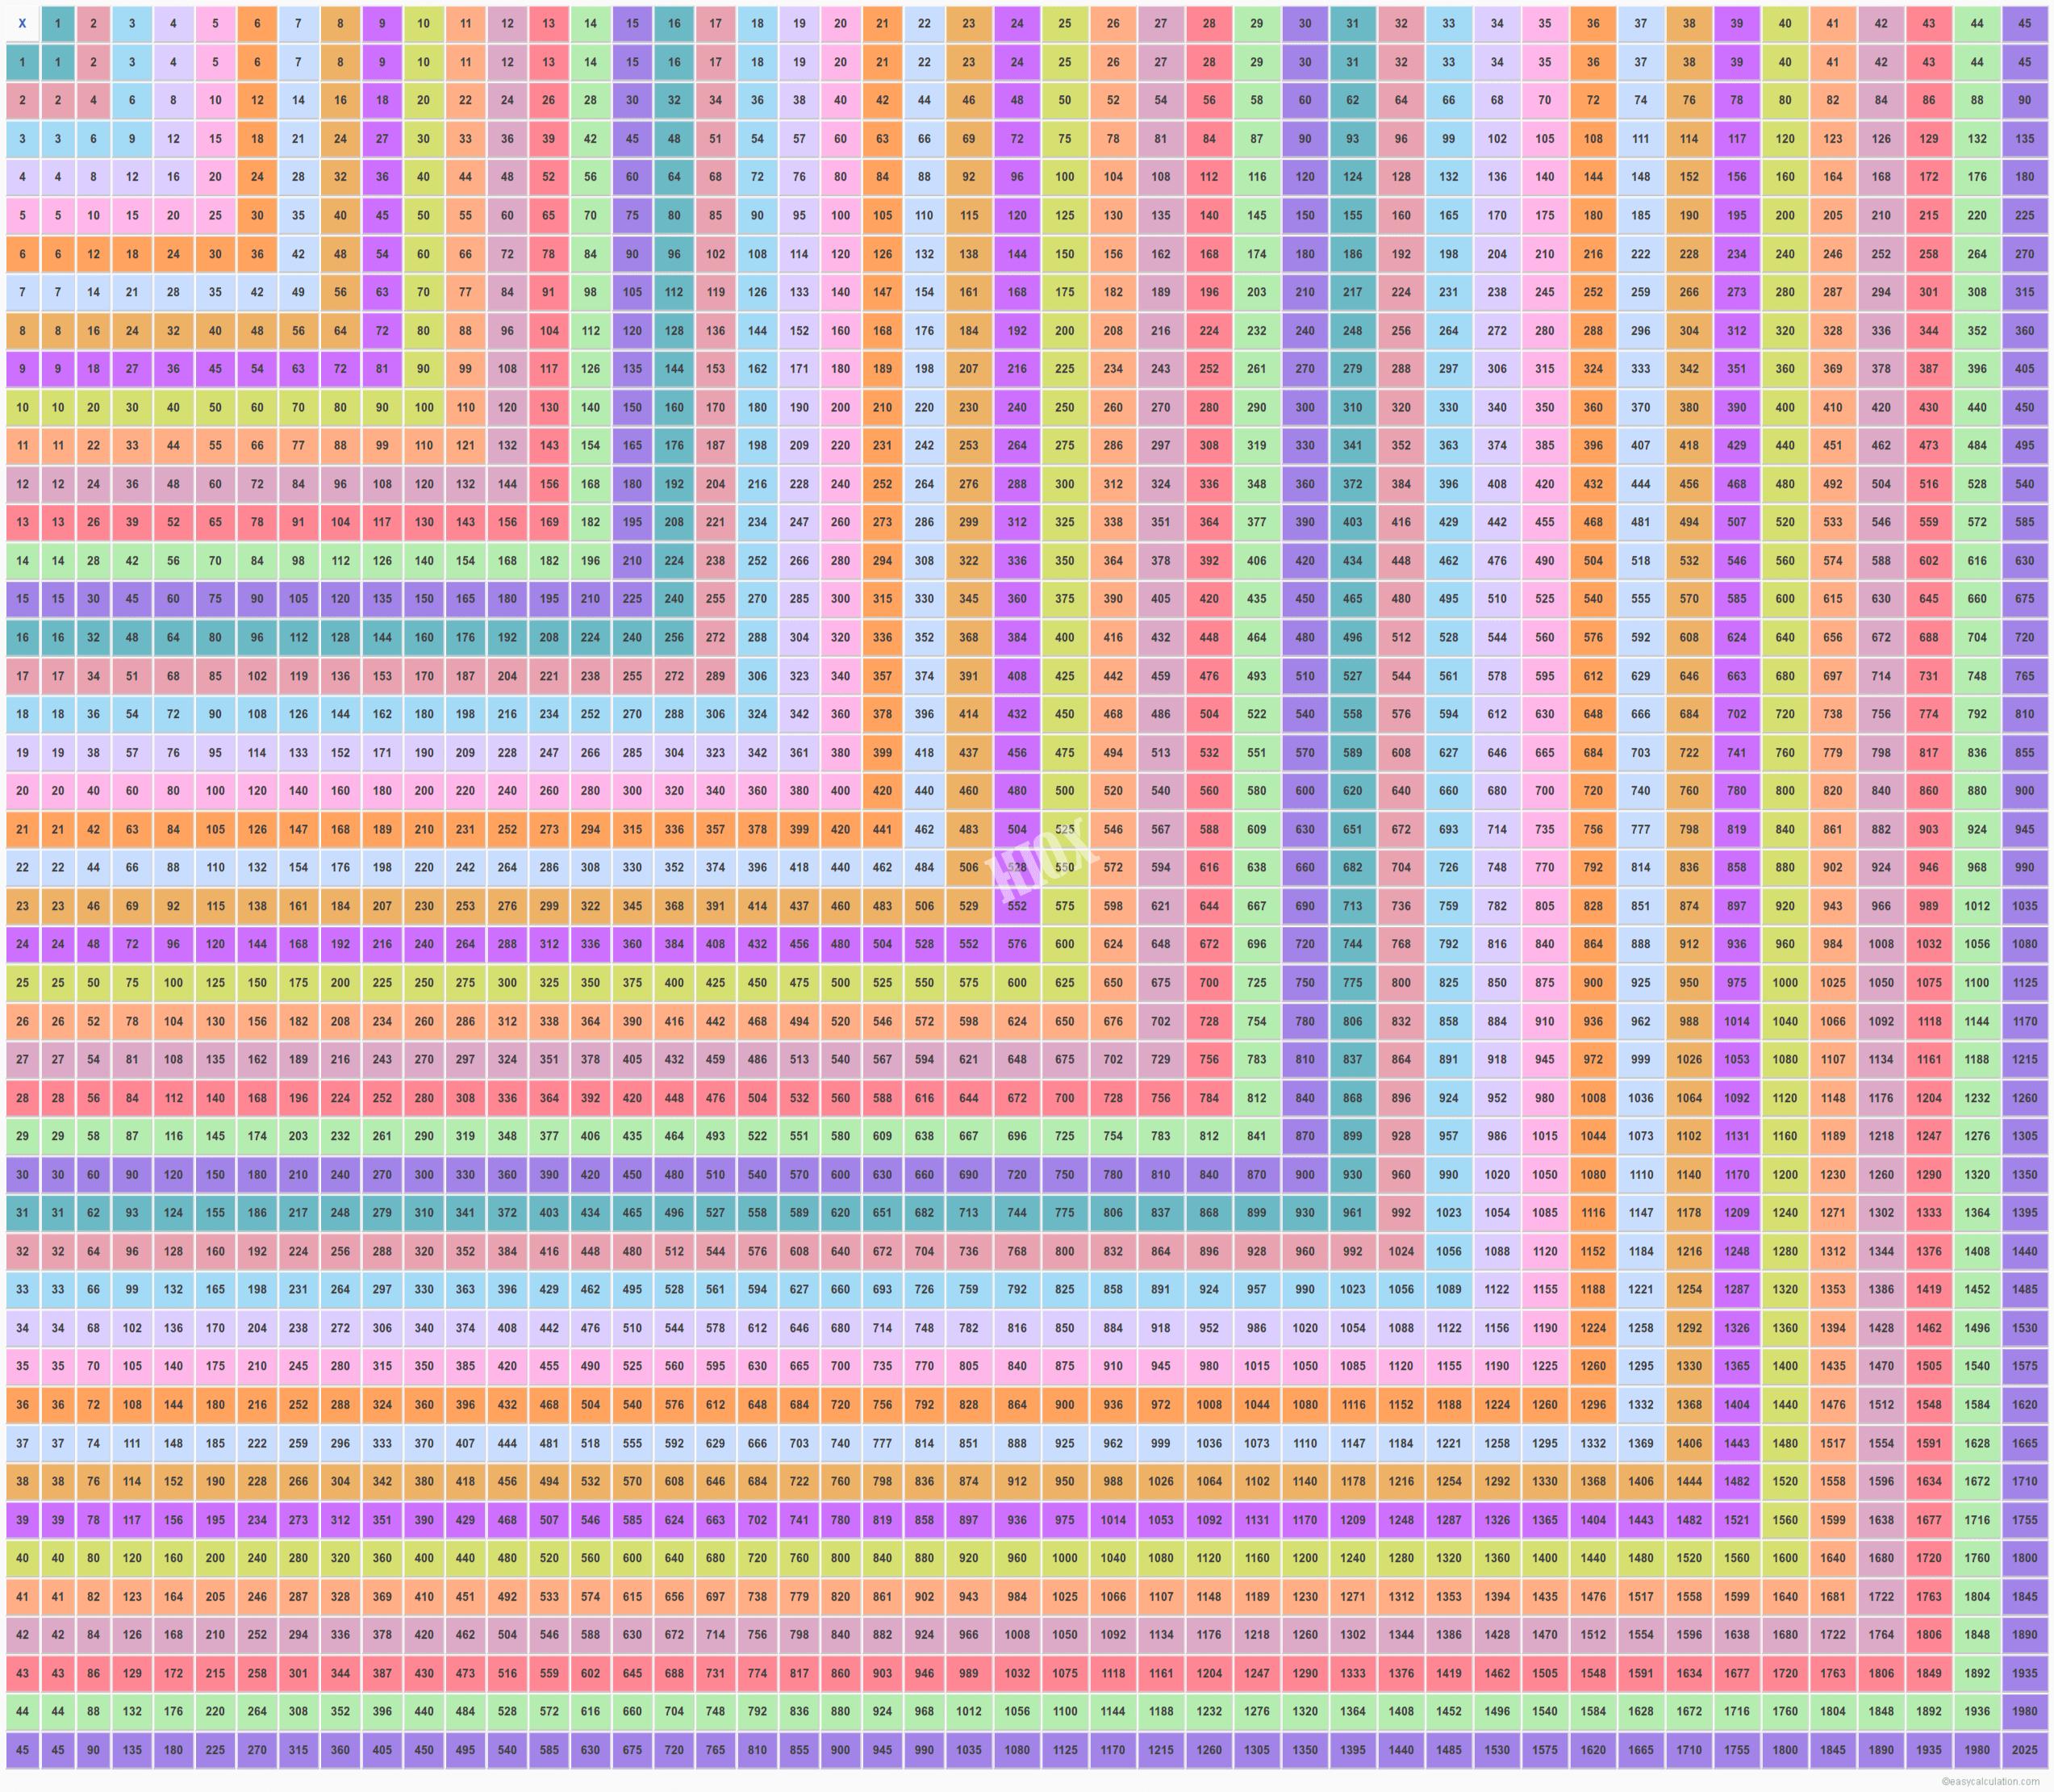 45×45 Multiplication Table   Multiplication Chart throughout Printable 100 Multiplication Chart